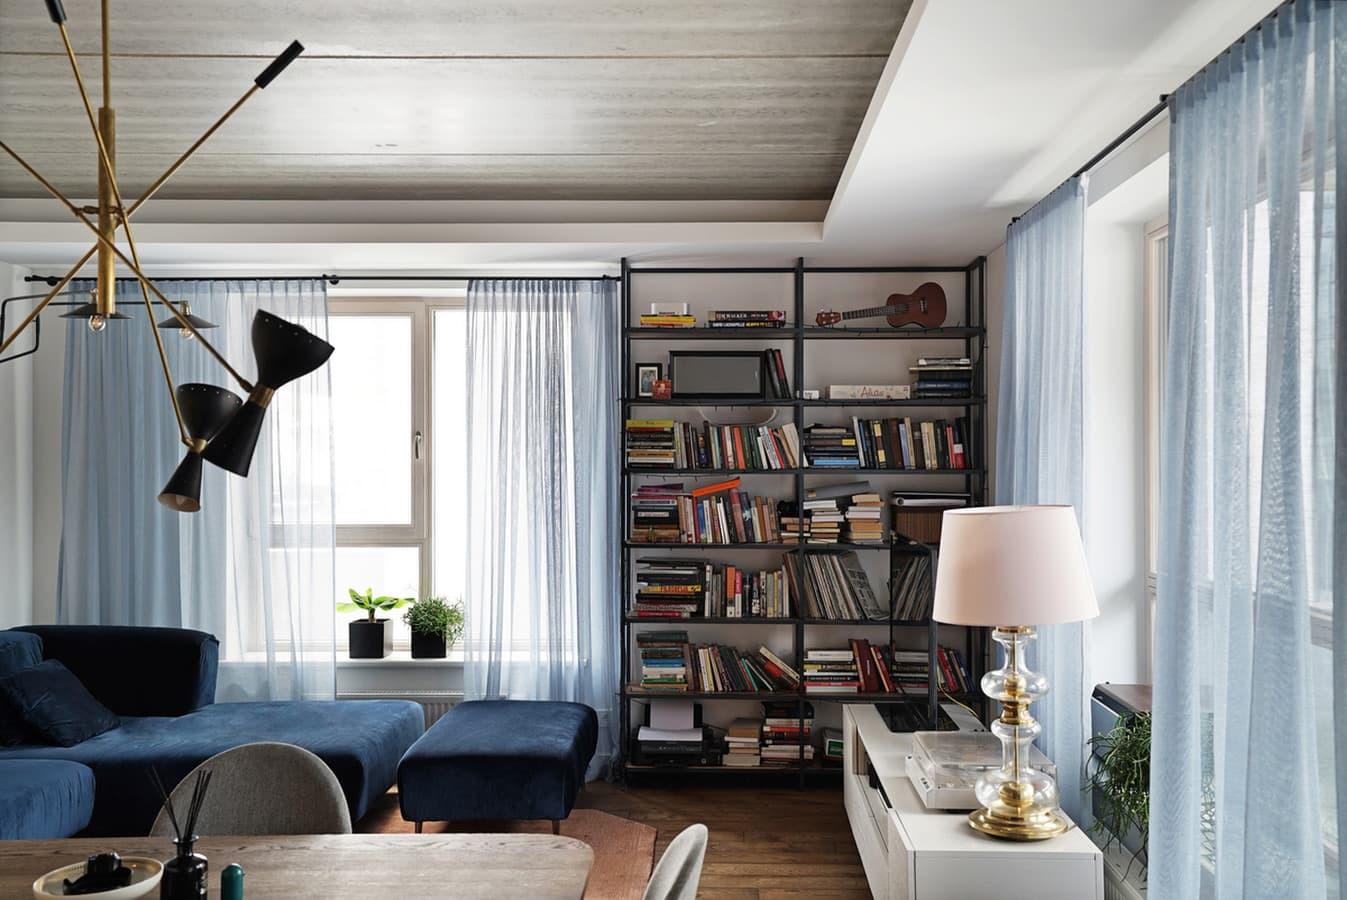 Buto interjeras - interjero dizainerė Laura Vanagaityte, Habitas - interjero dizainas studija